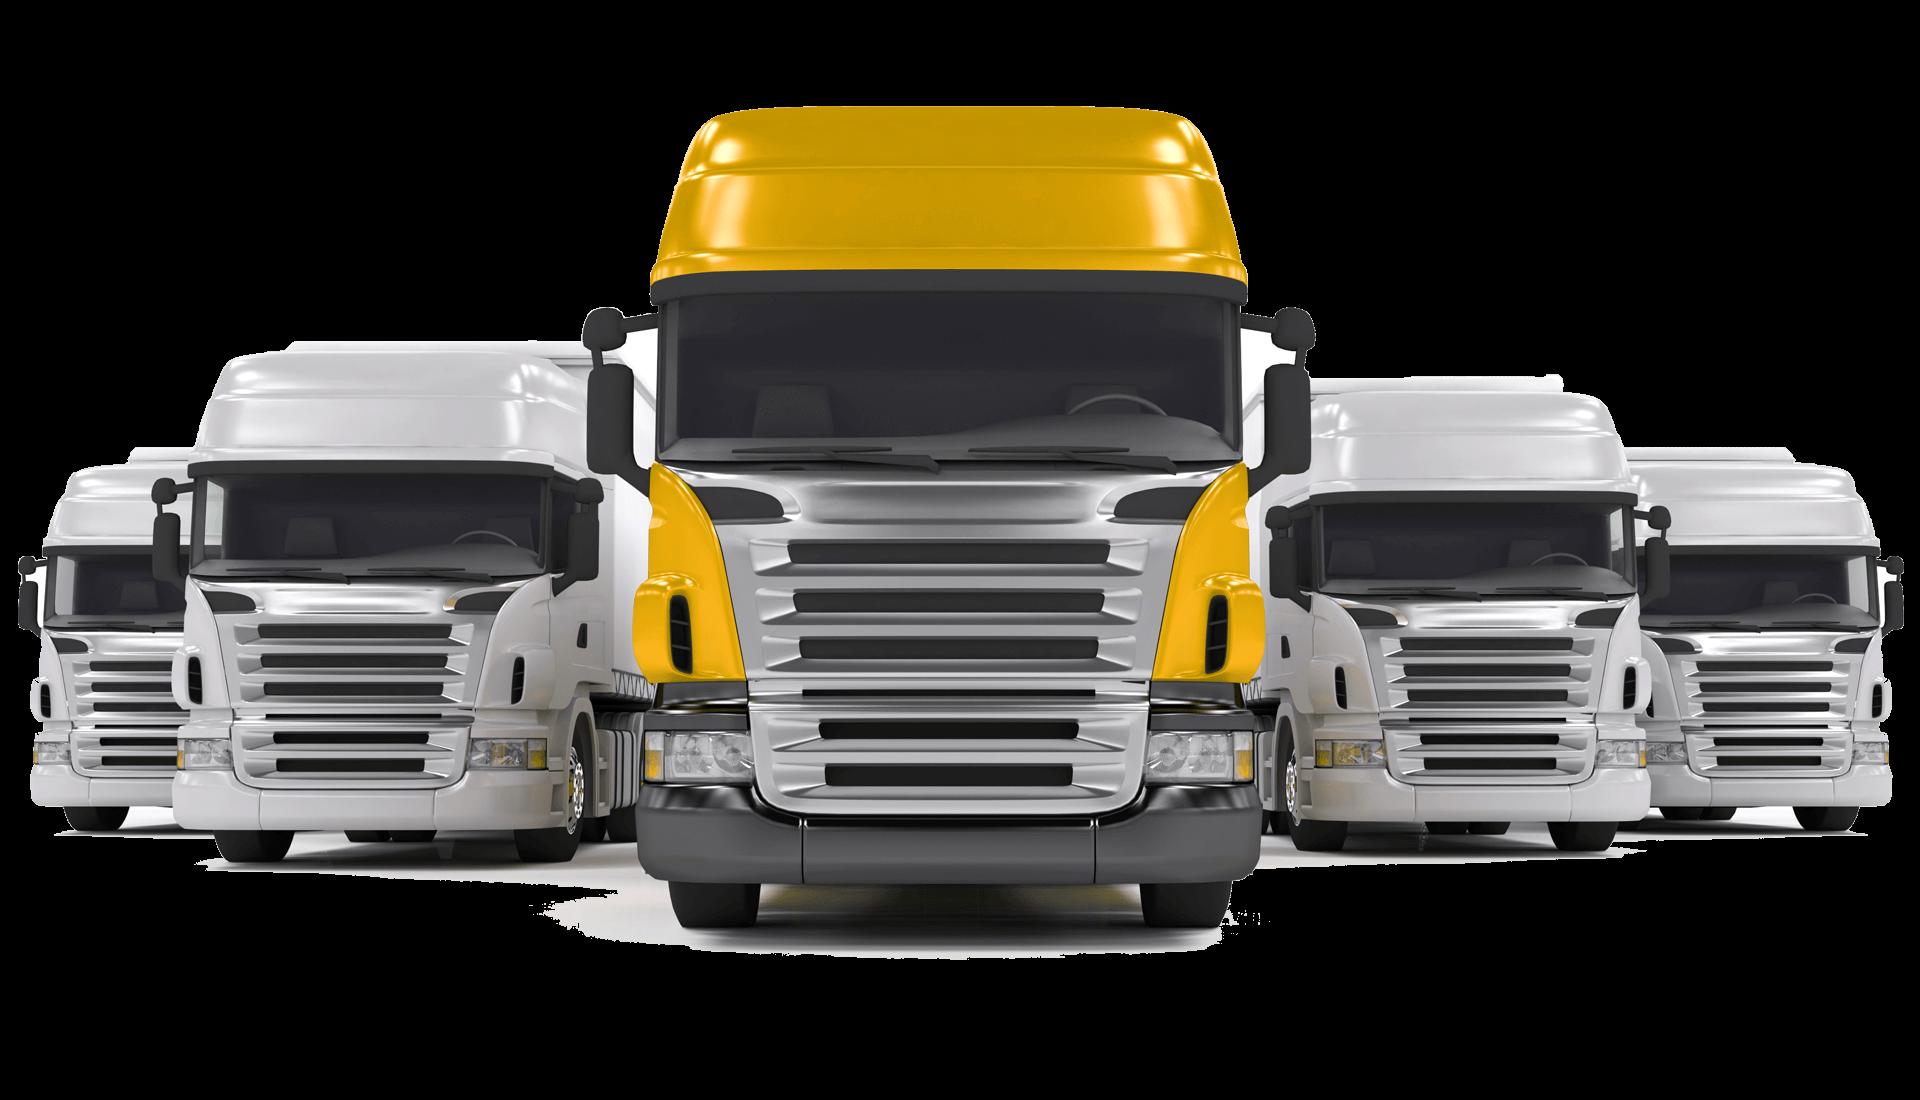 http://ilkemtur.com.tr/wp-content/uploads/2017/07/trucks.png